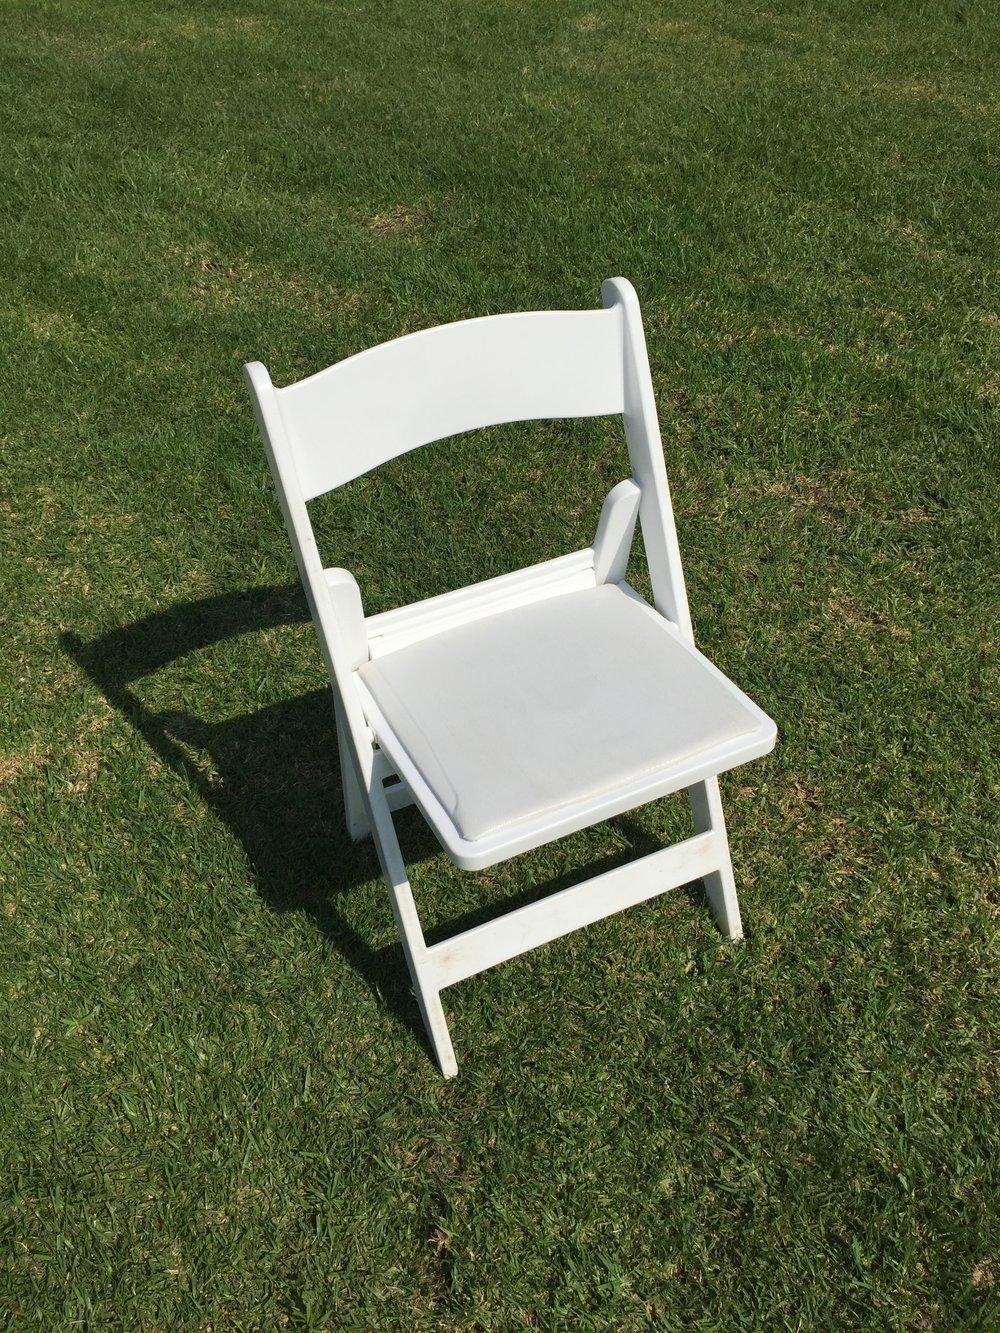 white-padded-resin-folding-chairs-1-300x225.jpg